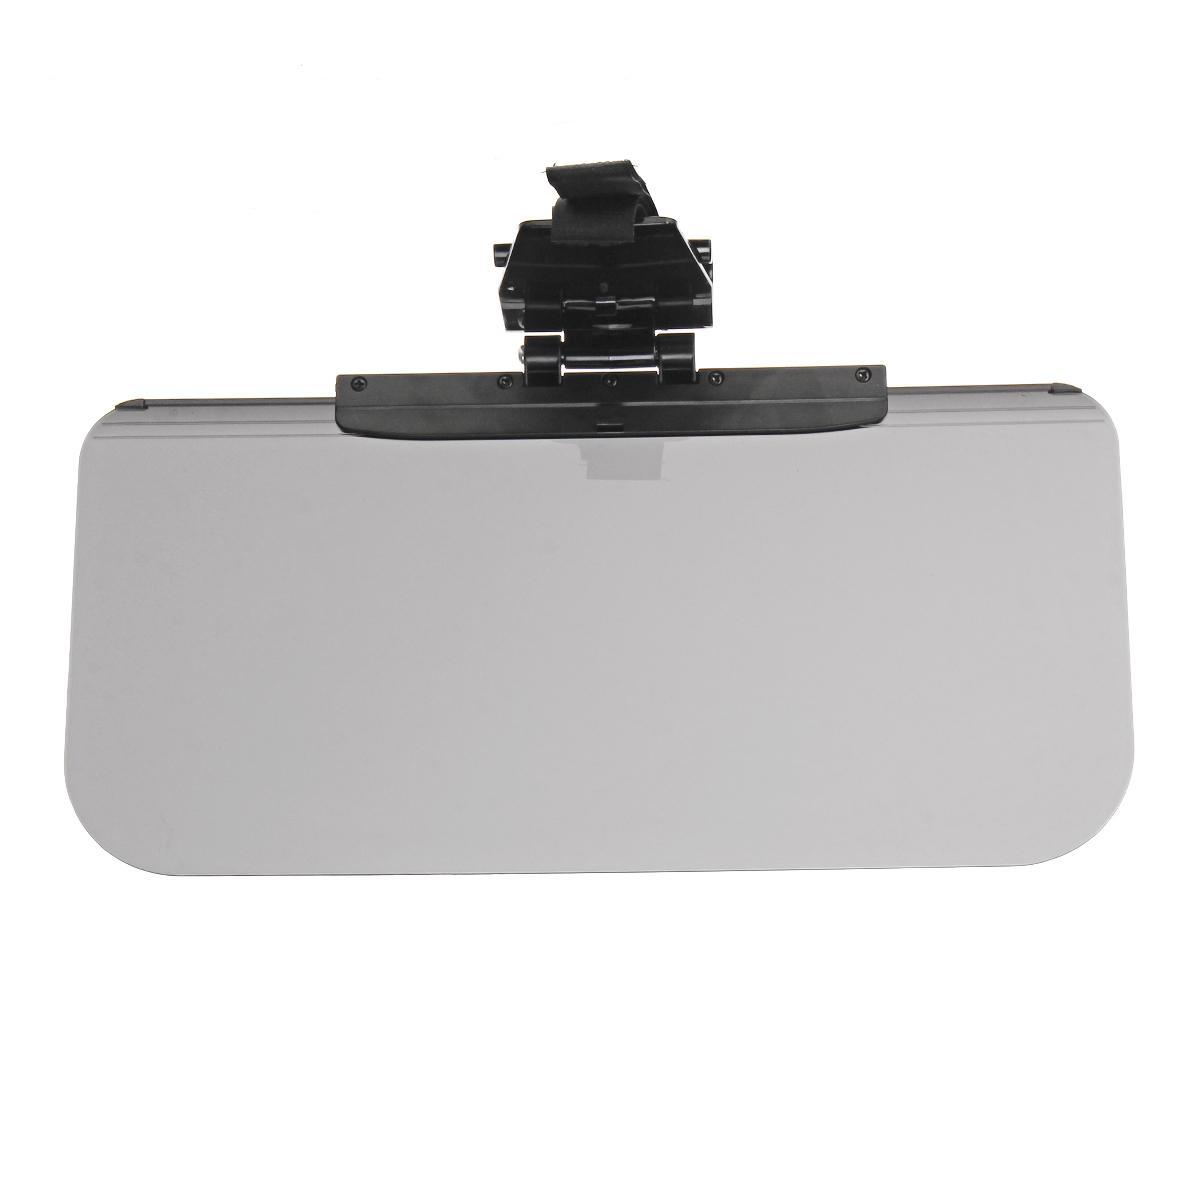 Car Big Screen and HD Vision Night Vision Shield Goggles Car Window Sunshade Curtain Adjustable Board